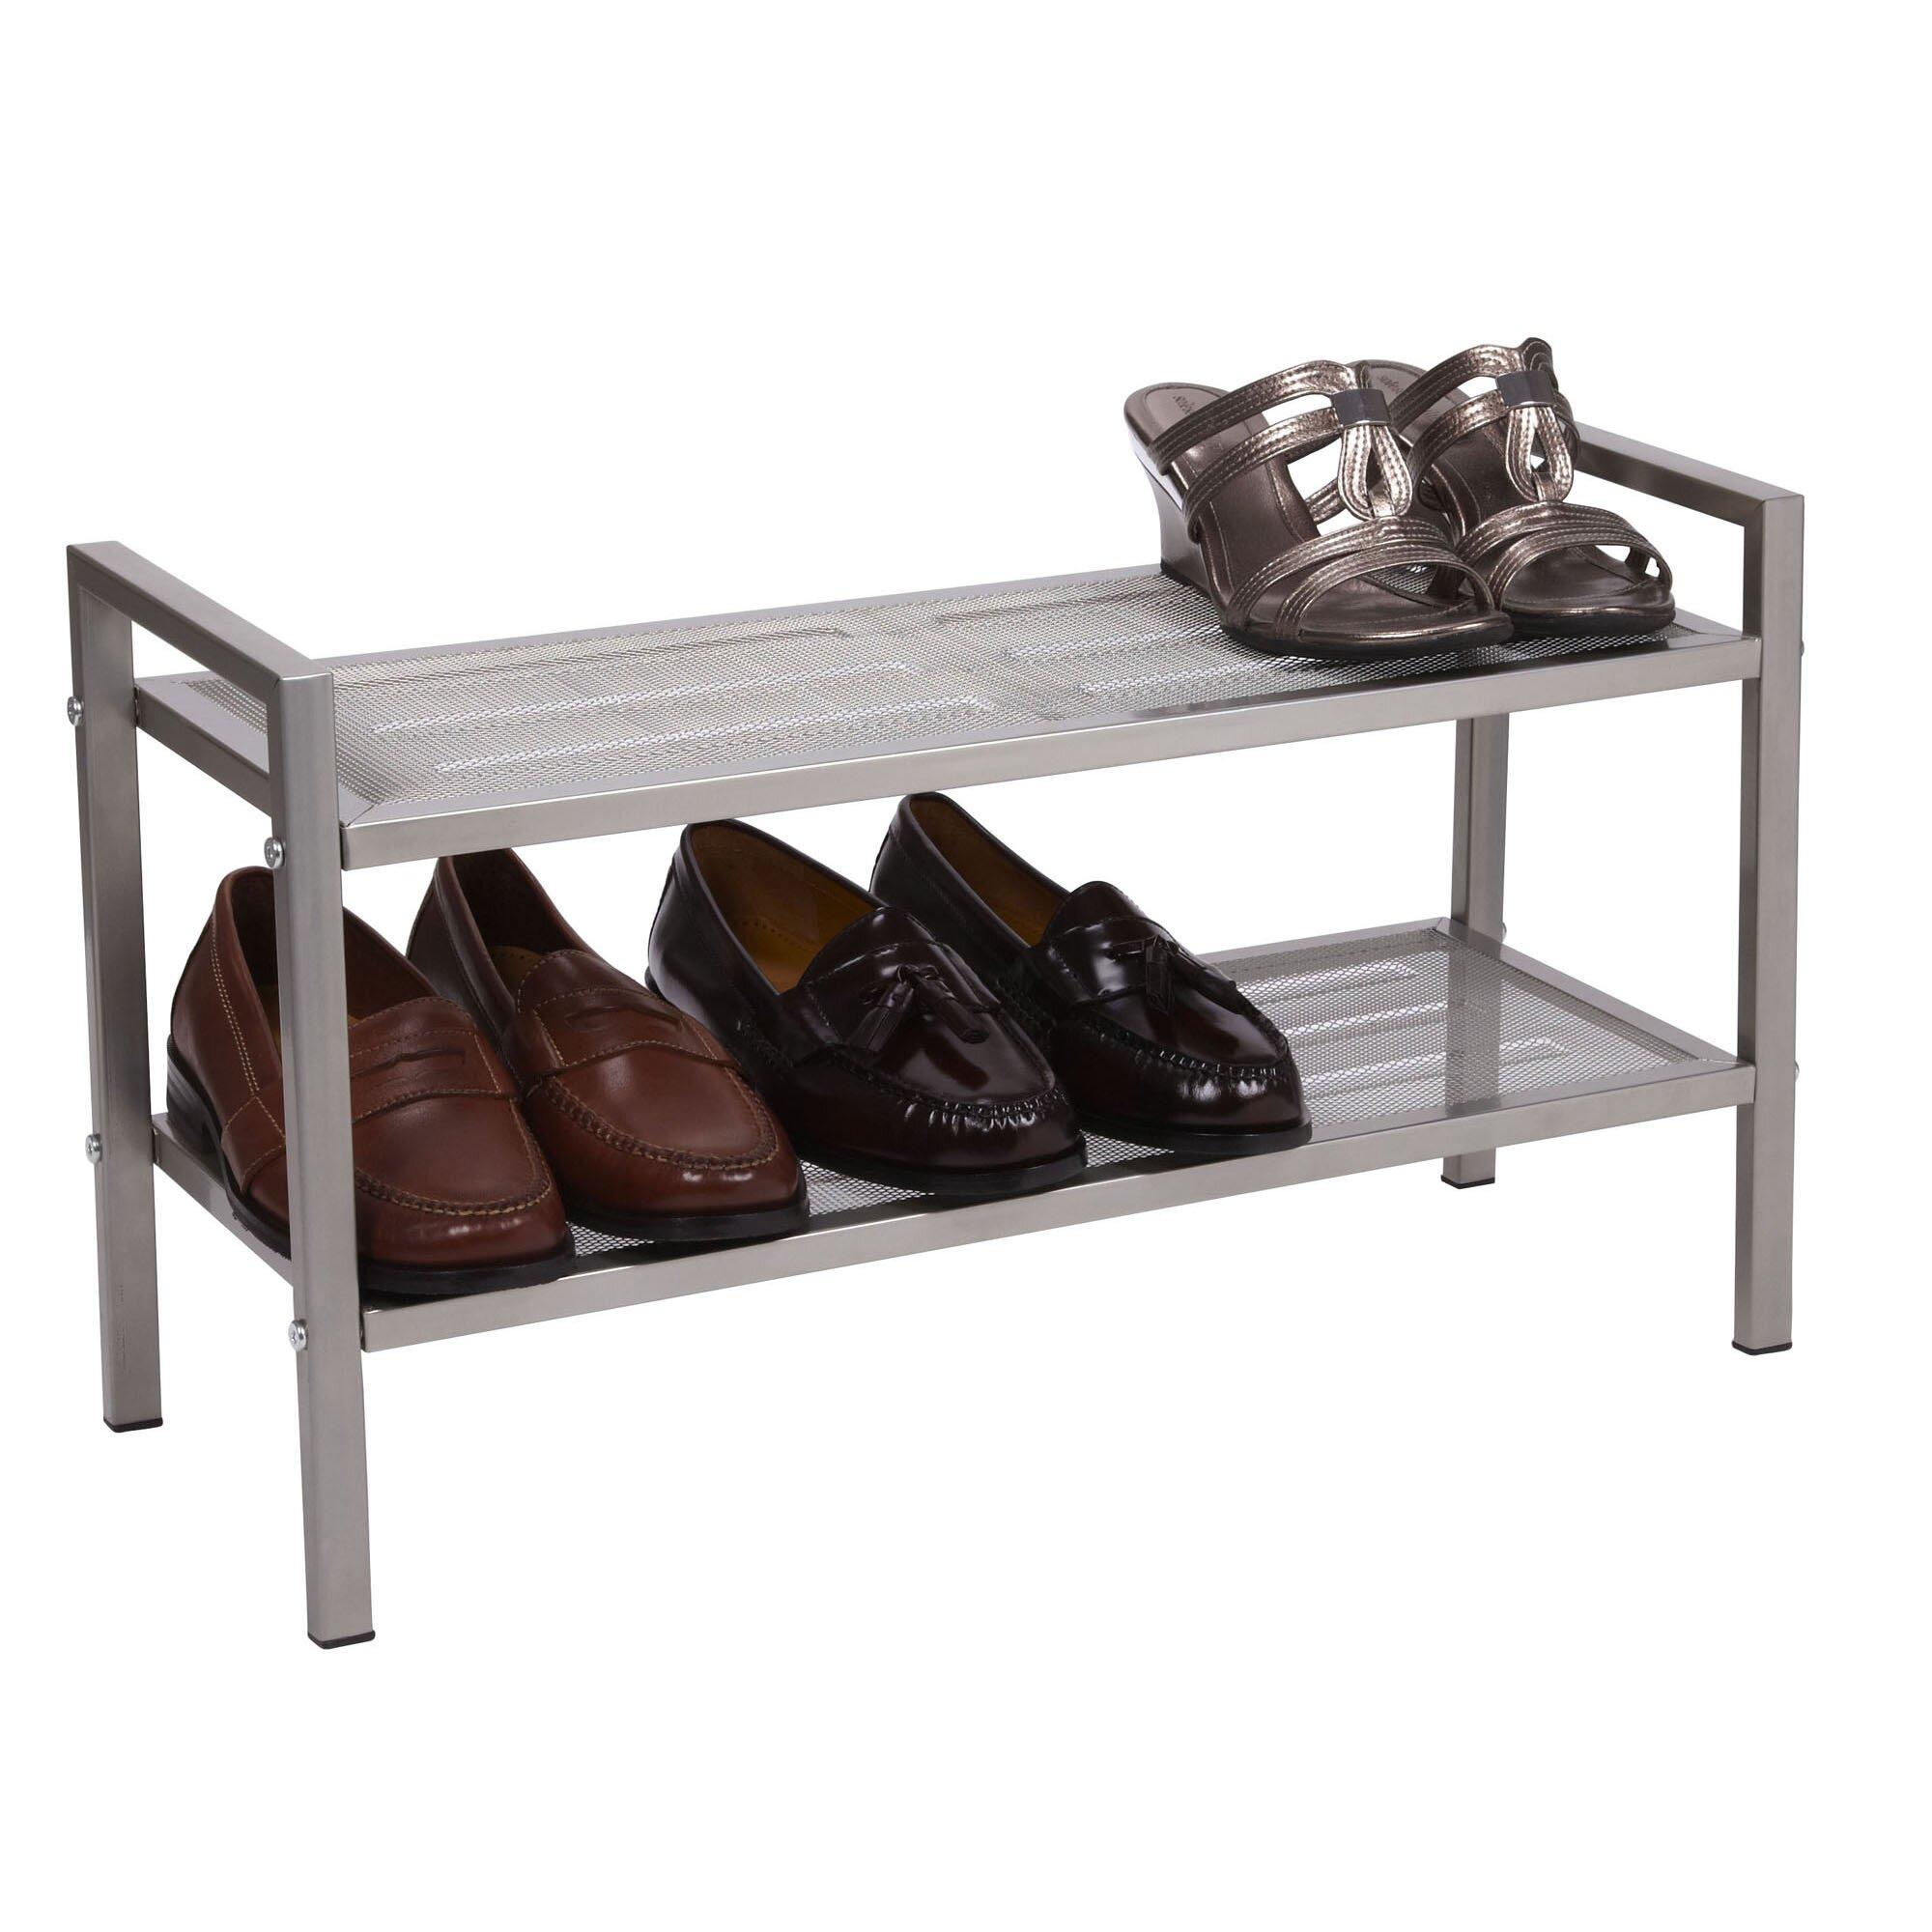 Household Essentials 2 Tier Shoe Rack Reviews Wayfair